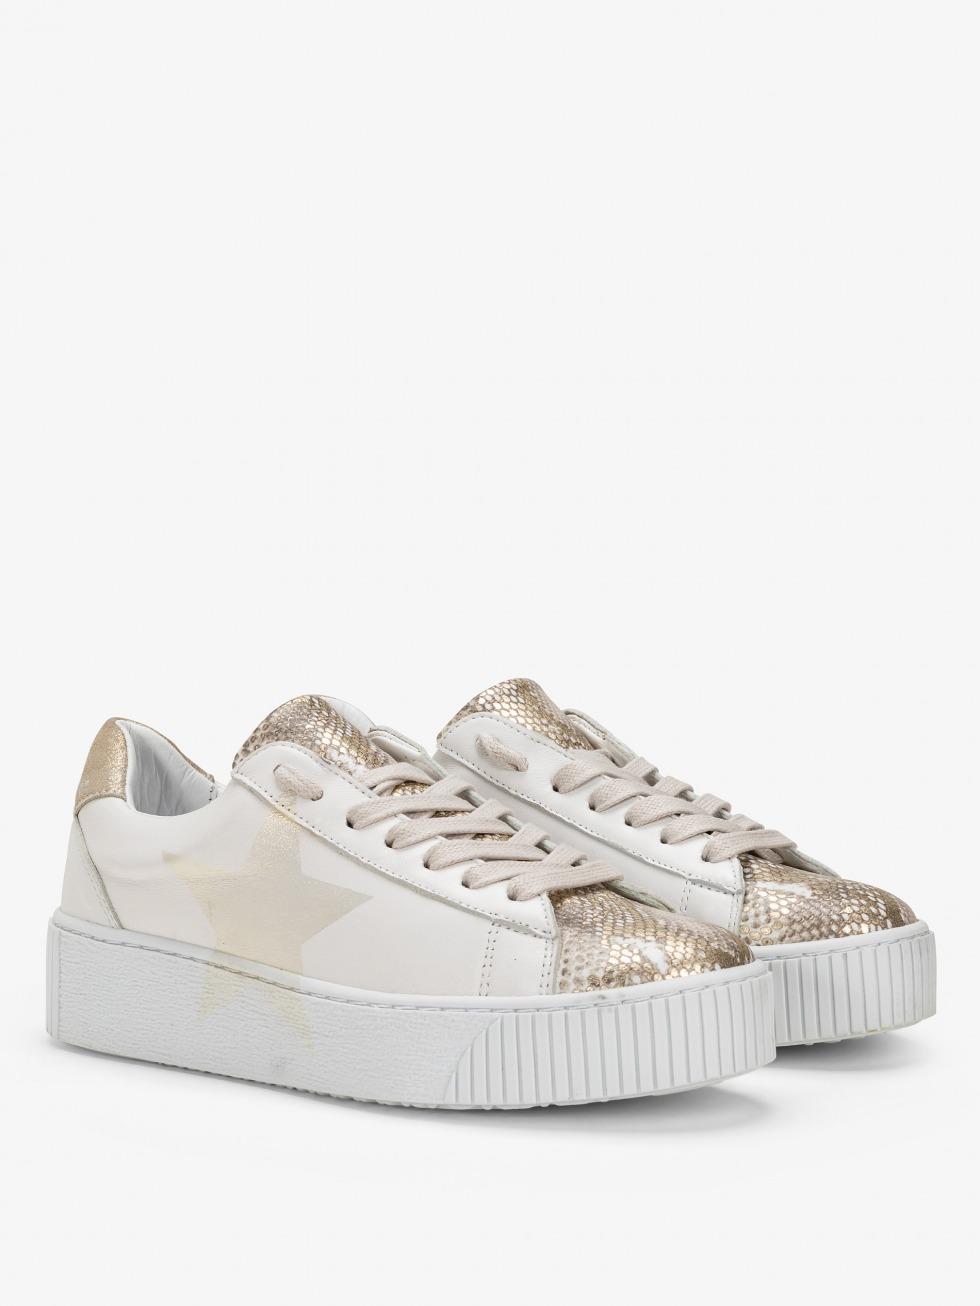 Cosmopolitan Sneakers - Phyton Gold Star